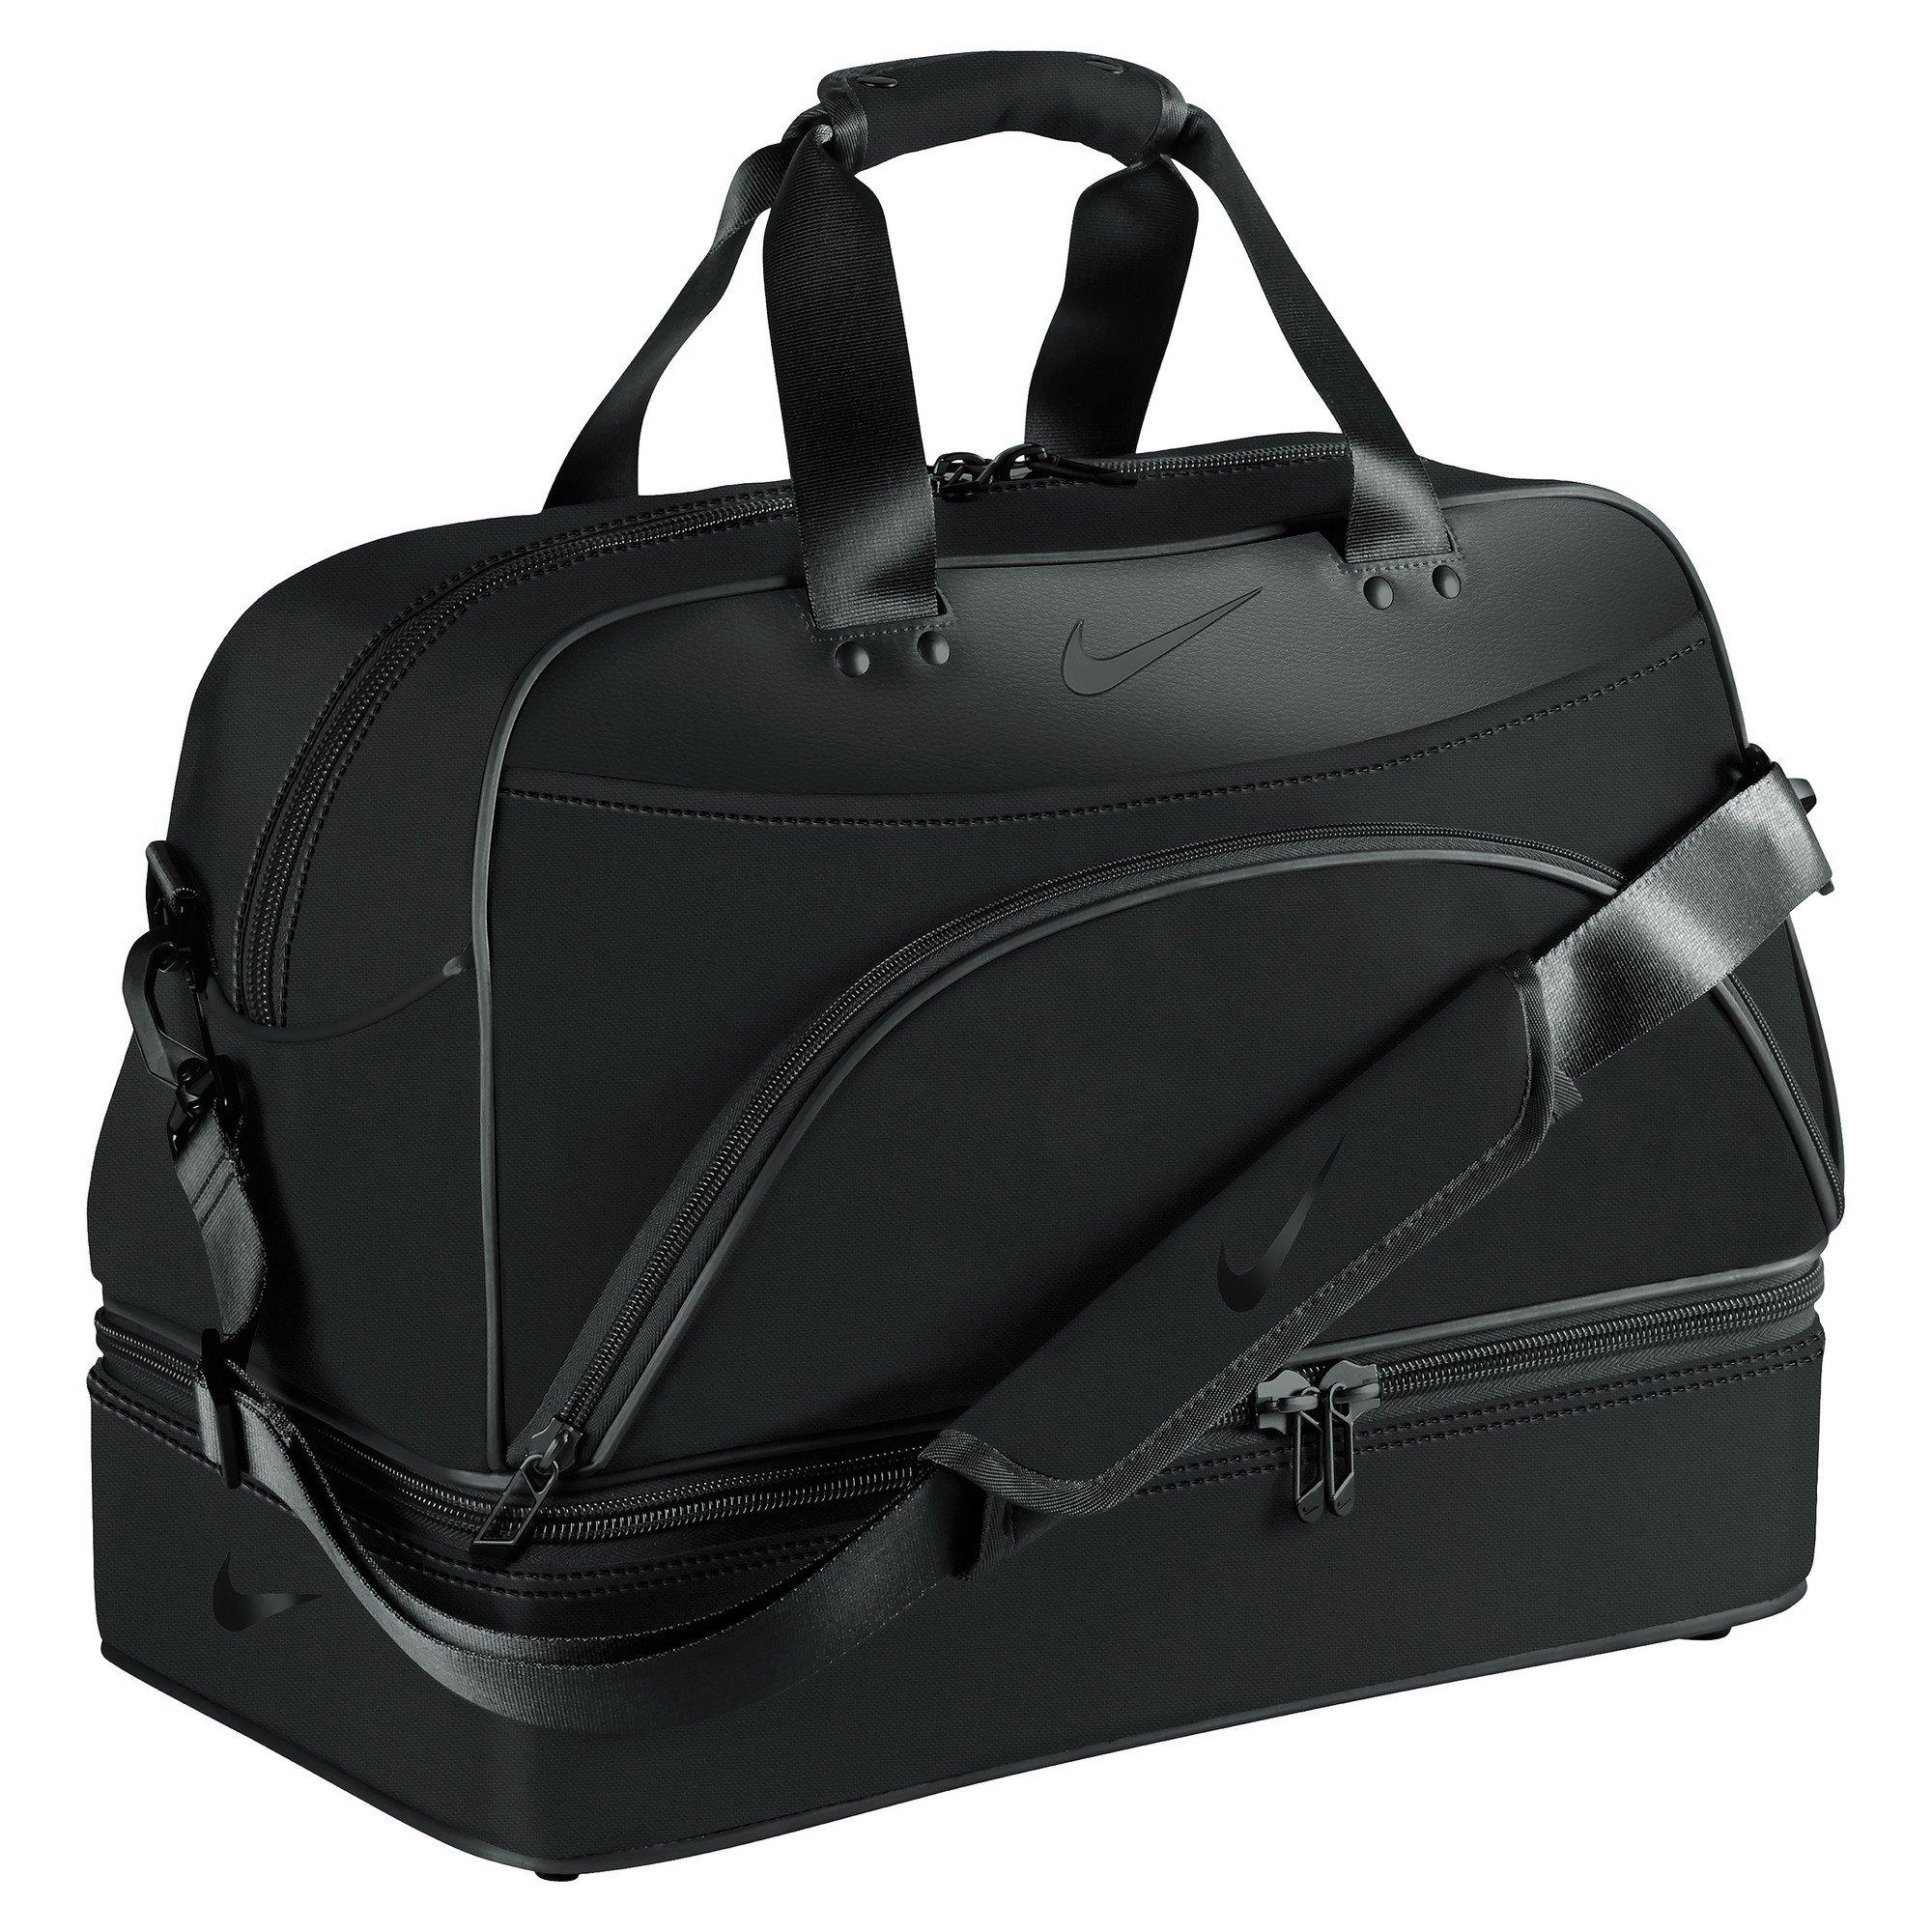 Nike Departure III Boston Holdall Bag (One Size) (Black) by NIKE